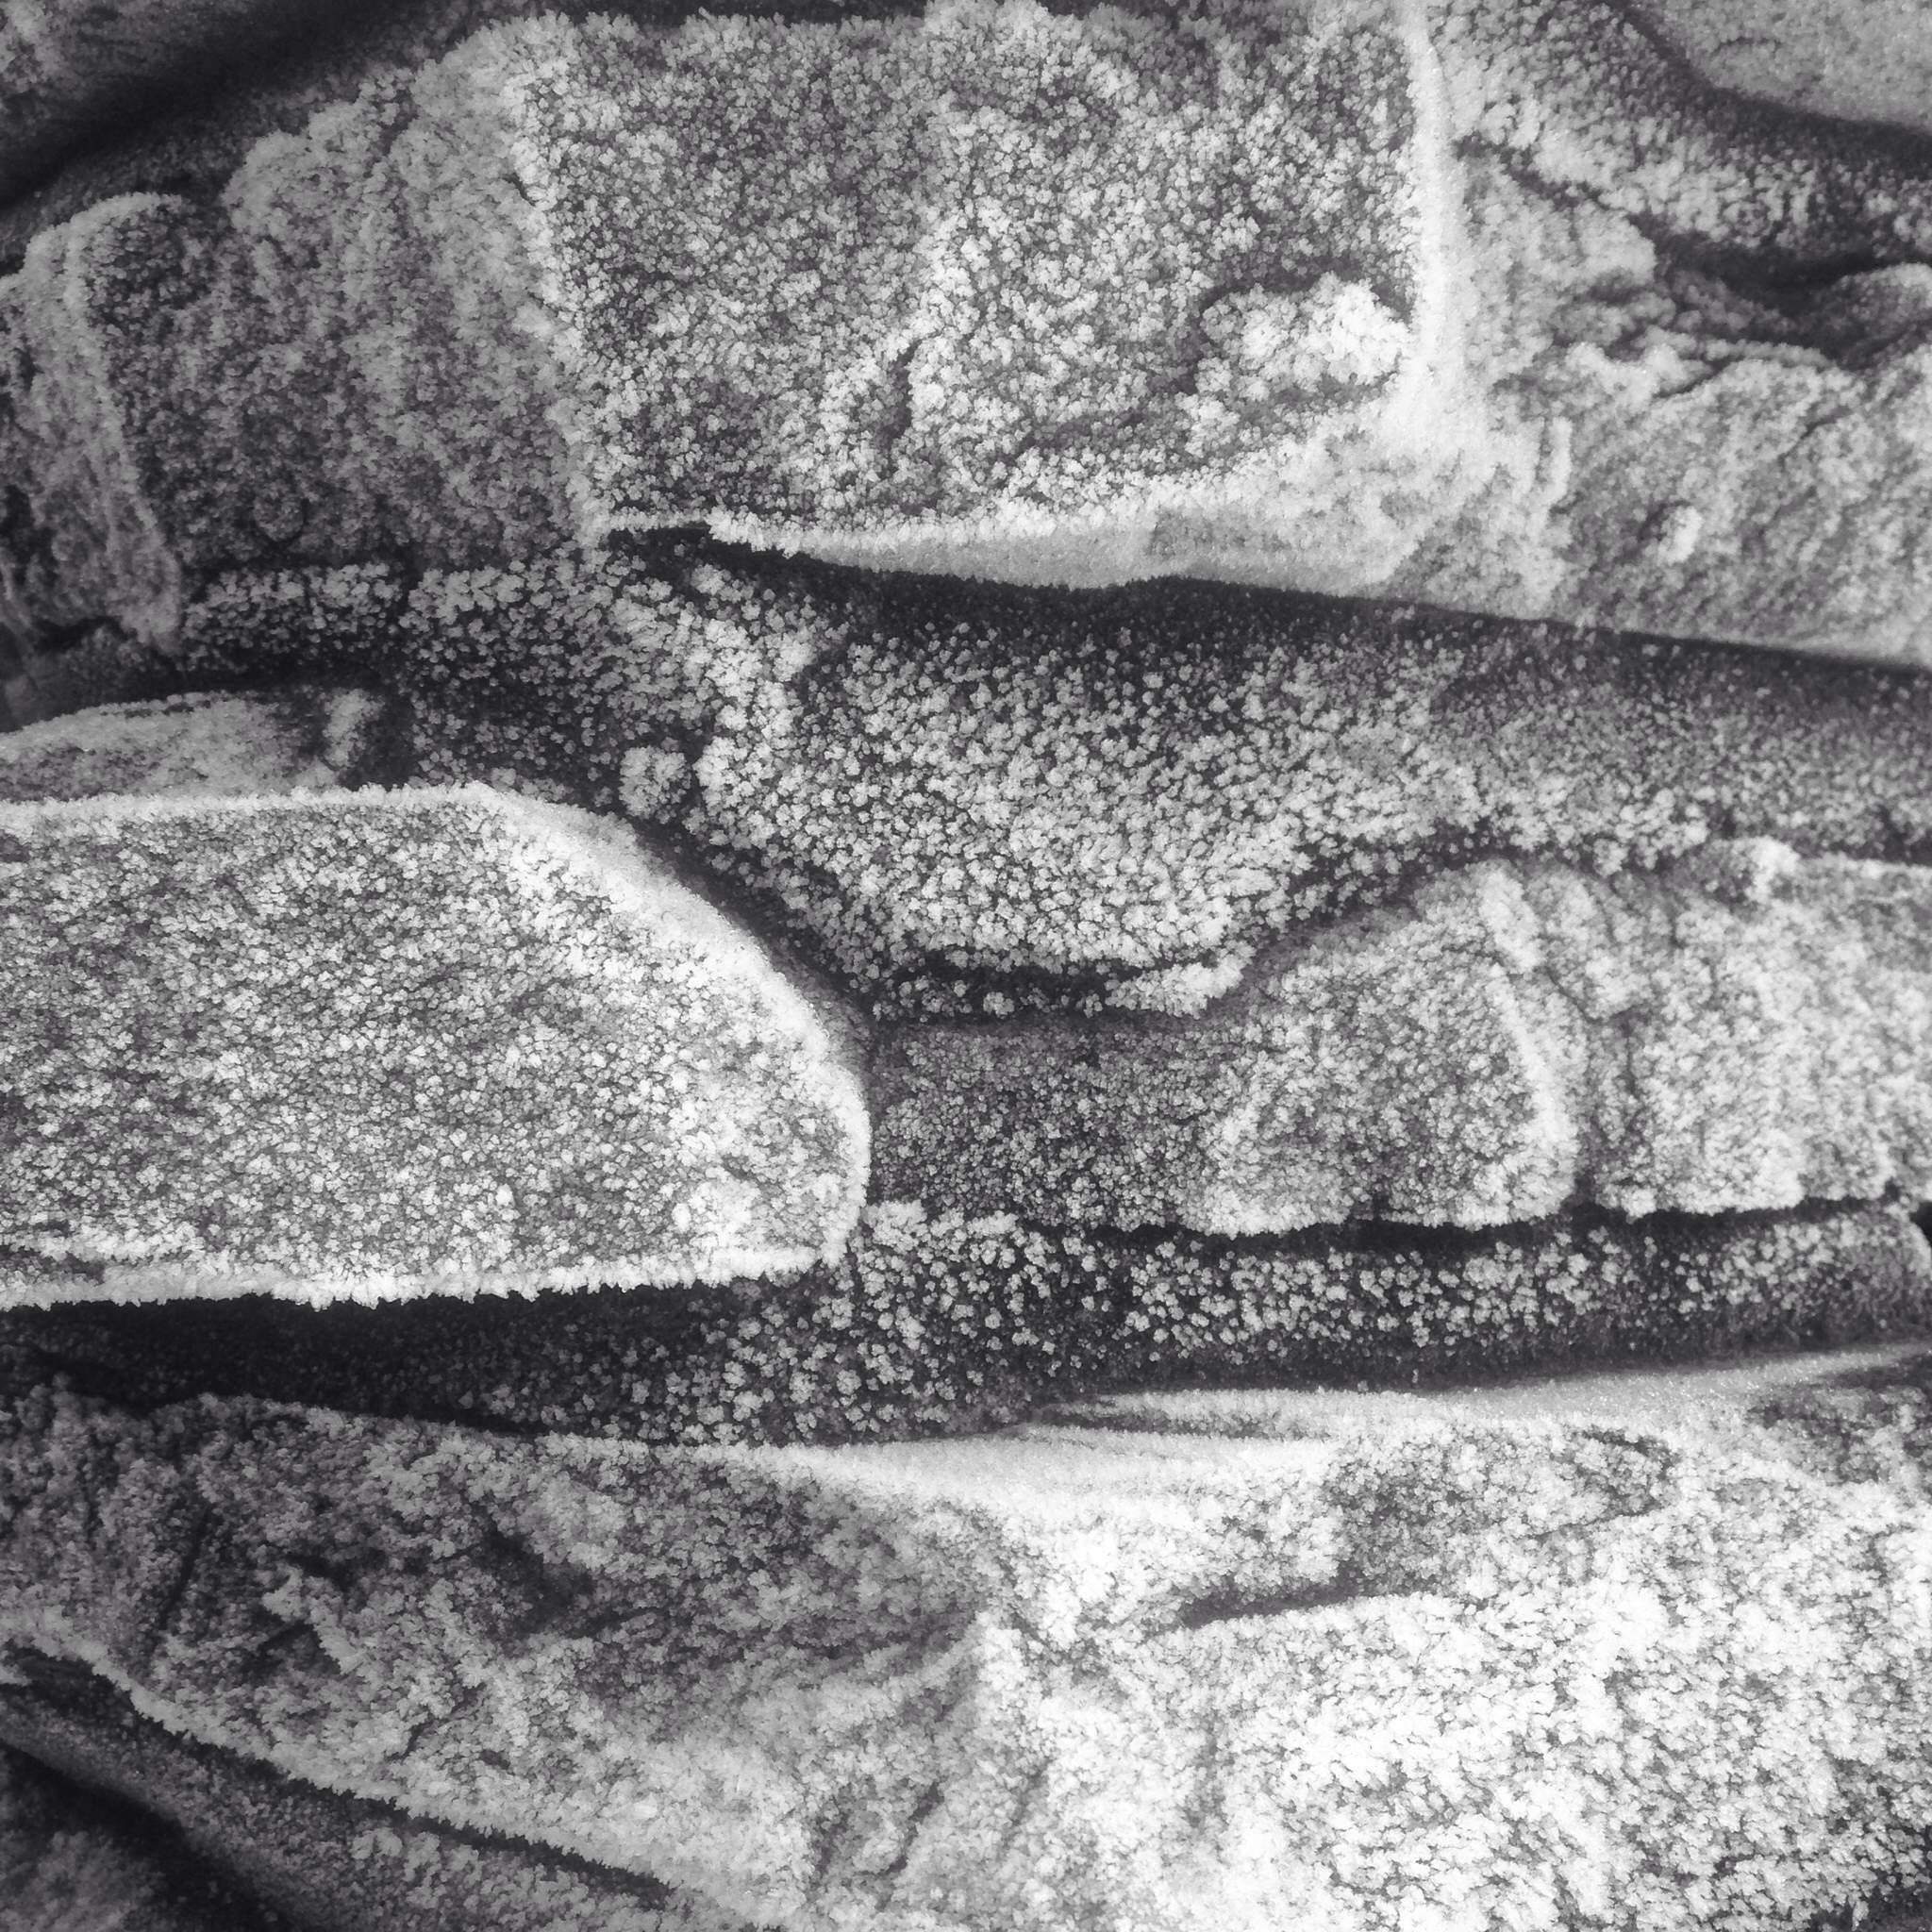 Yorkshire stone work